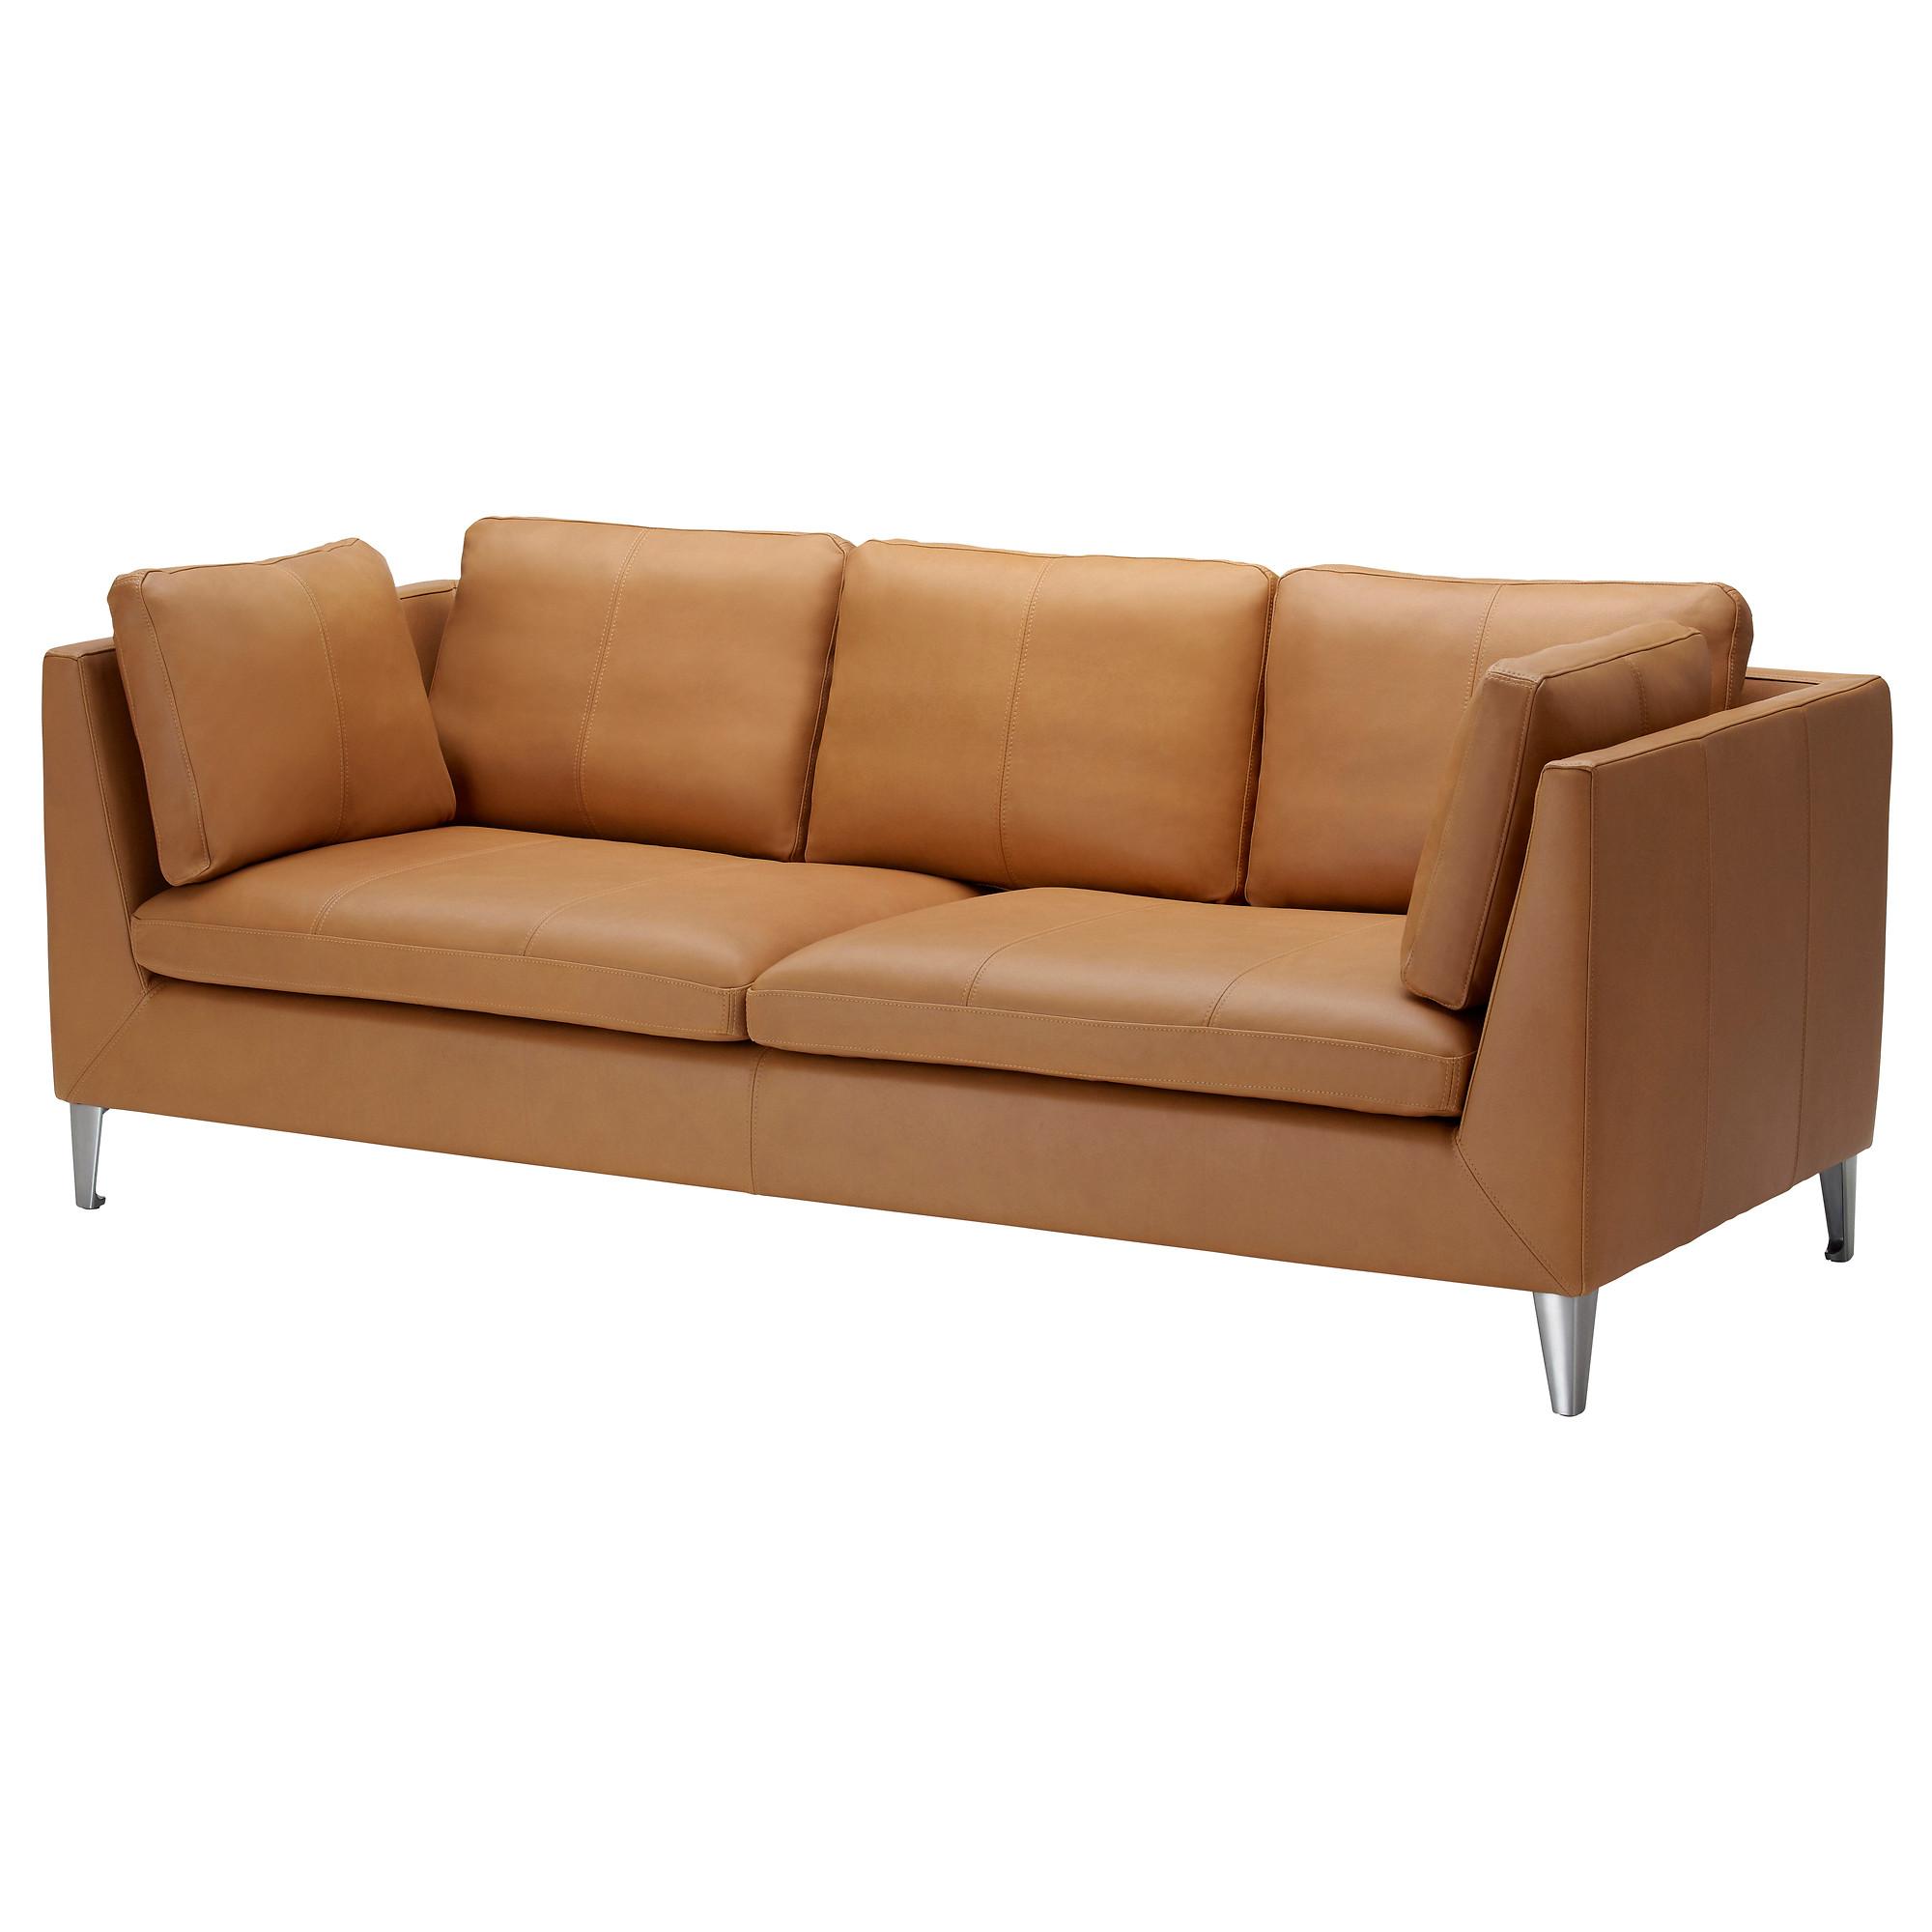 faux leather sofa stockholm sofa, seglora natural width: 83 1/8  OVOGBSH